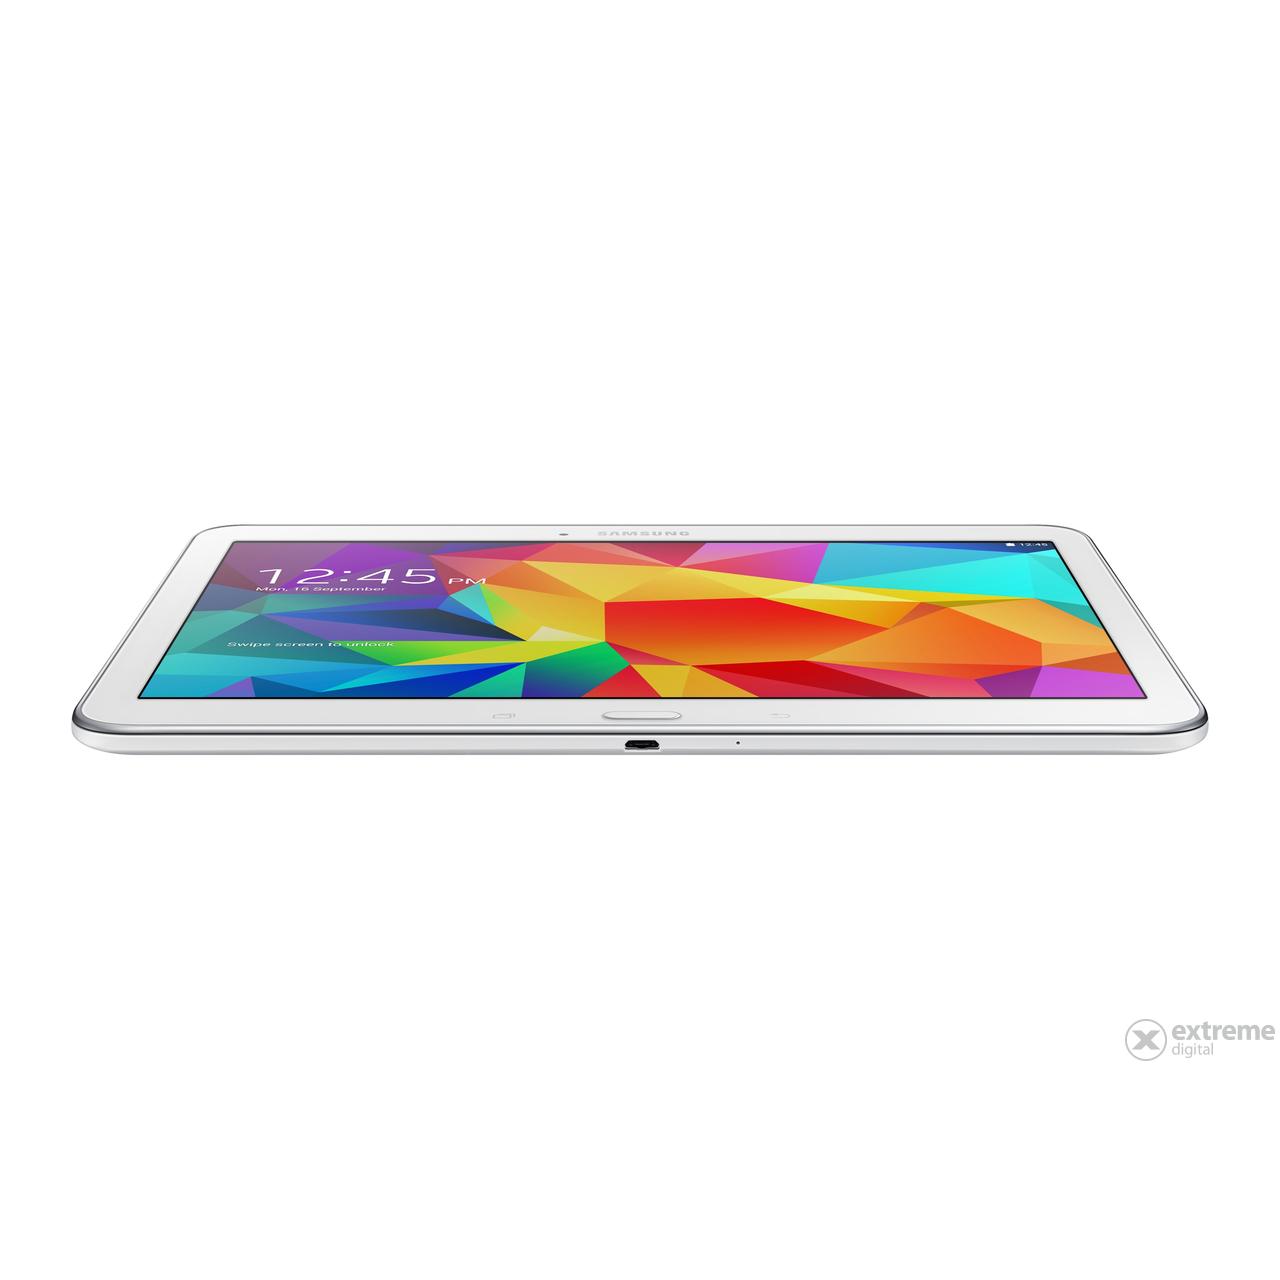 samsung galaxy tab 4 10 1 wifi lte 16gb sm t535 tablet. Black Bedroom Furniture Sets. Home Design Ideas